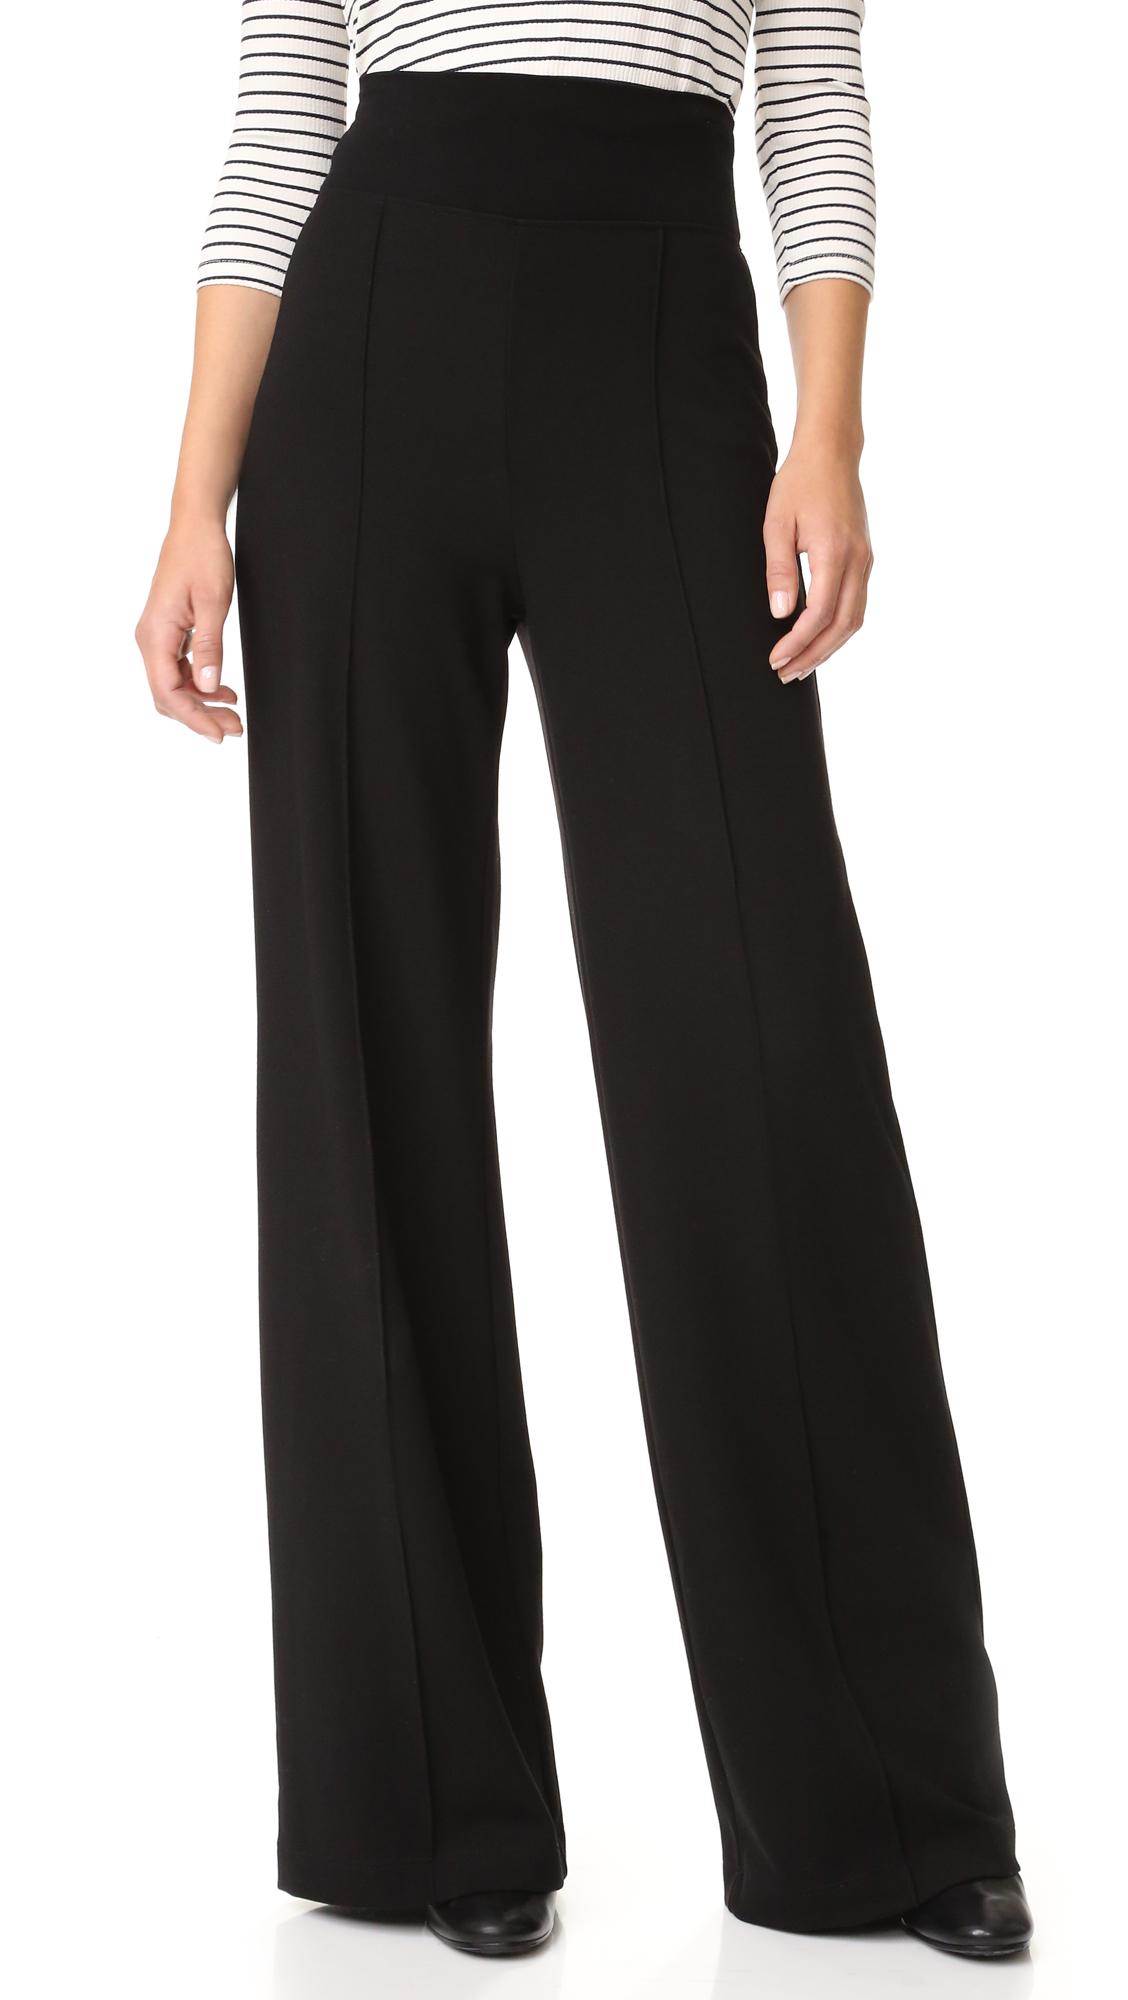 0 long dress pants under 20